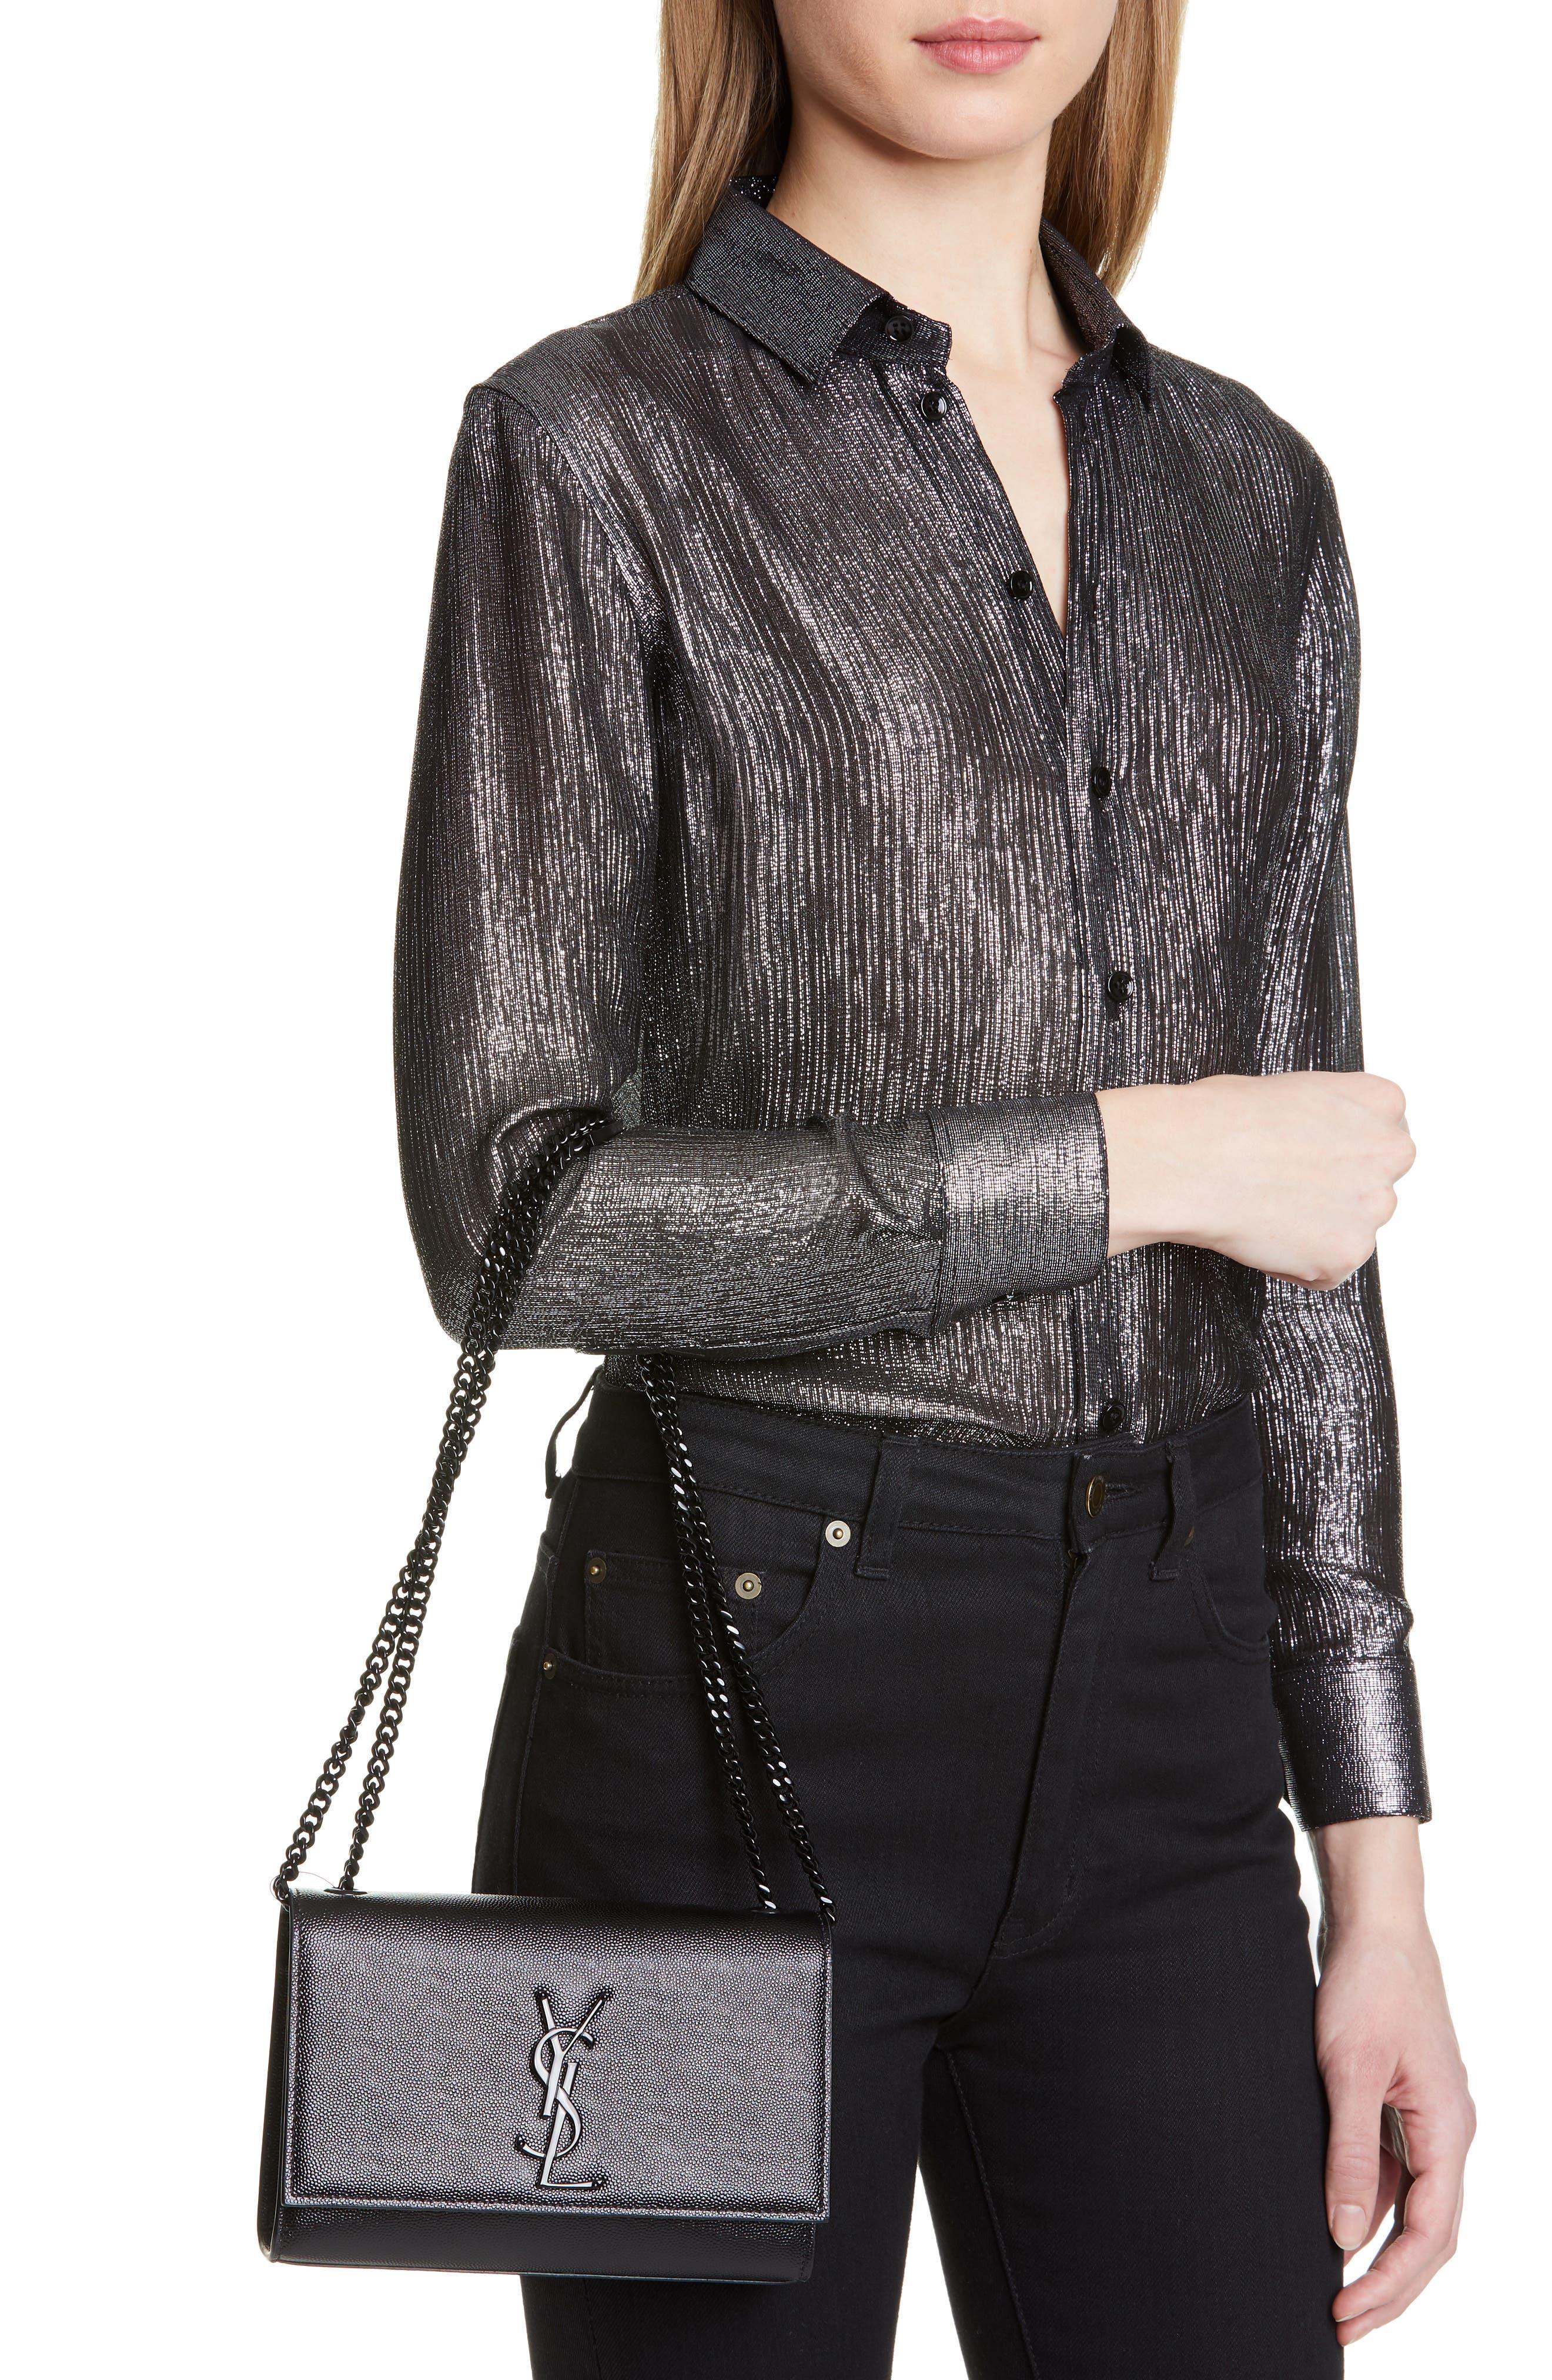 SAINT LAURENT, Small Kate Leather Shoulder Bag, Alternate thumbnail 3, color, BLACK